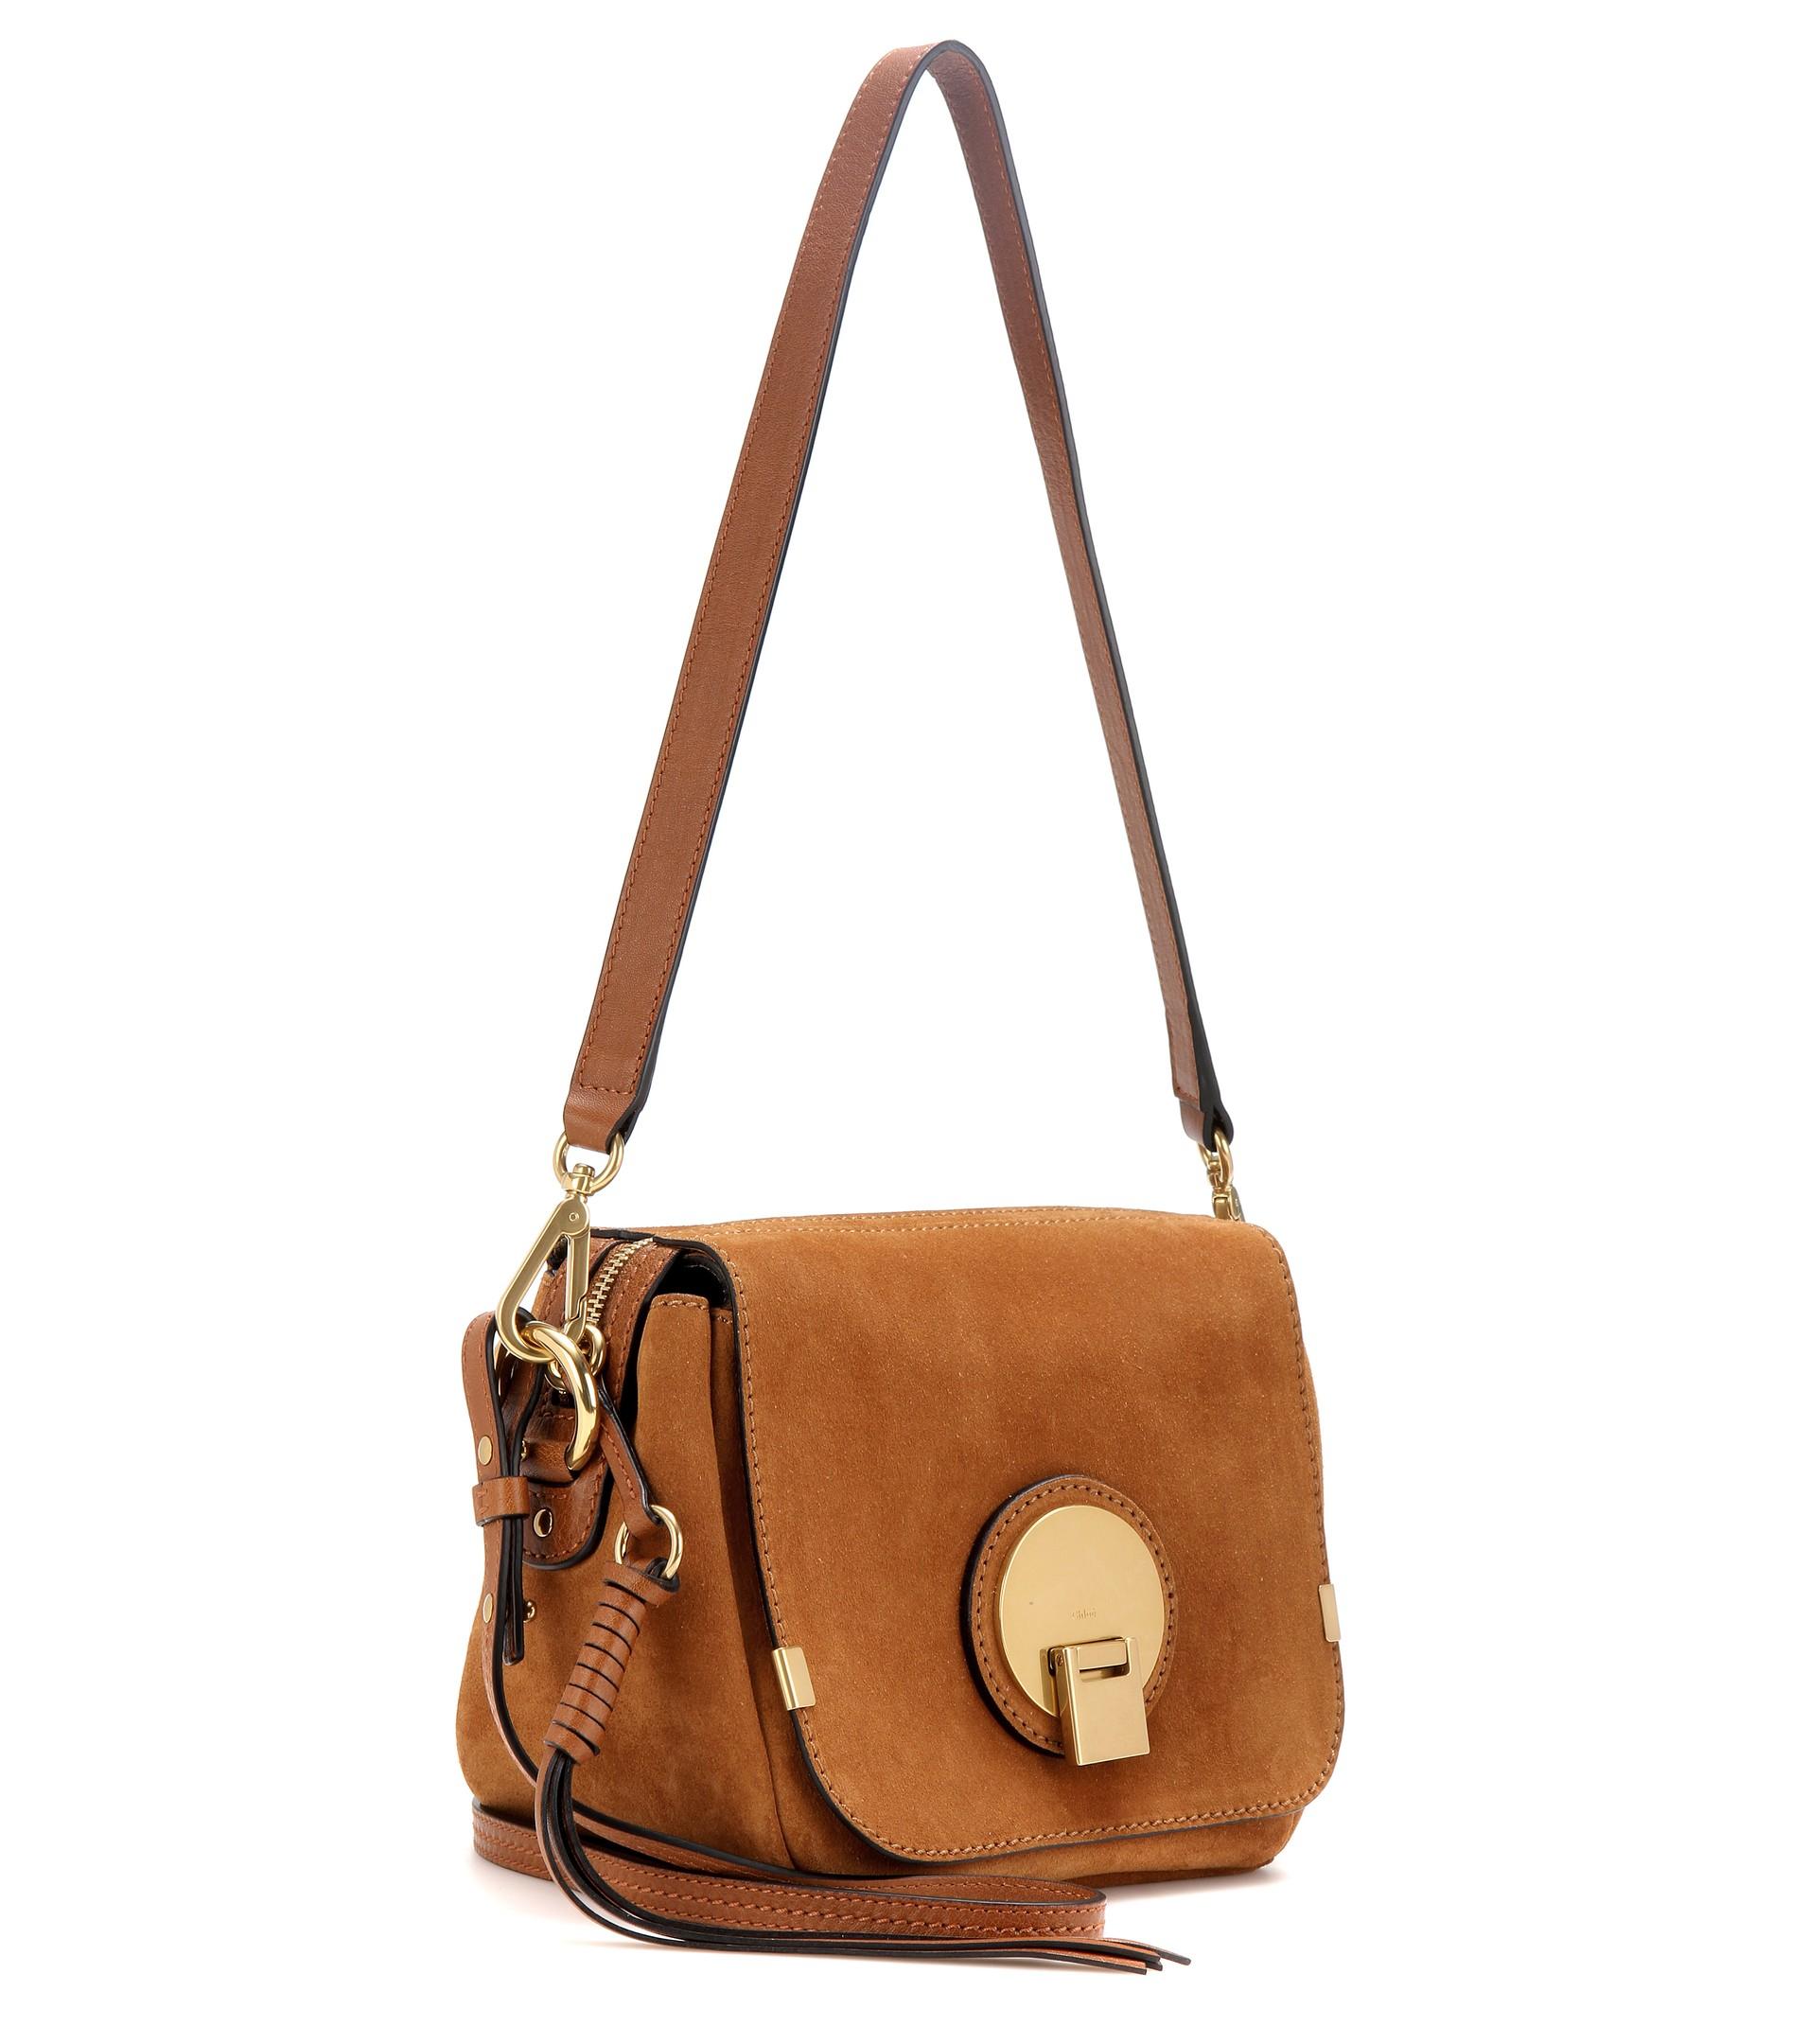 chloe knock off - chloe black suede small indy bag, chleo handbags